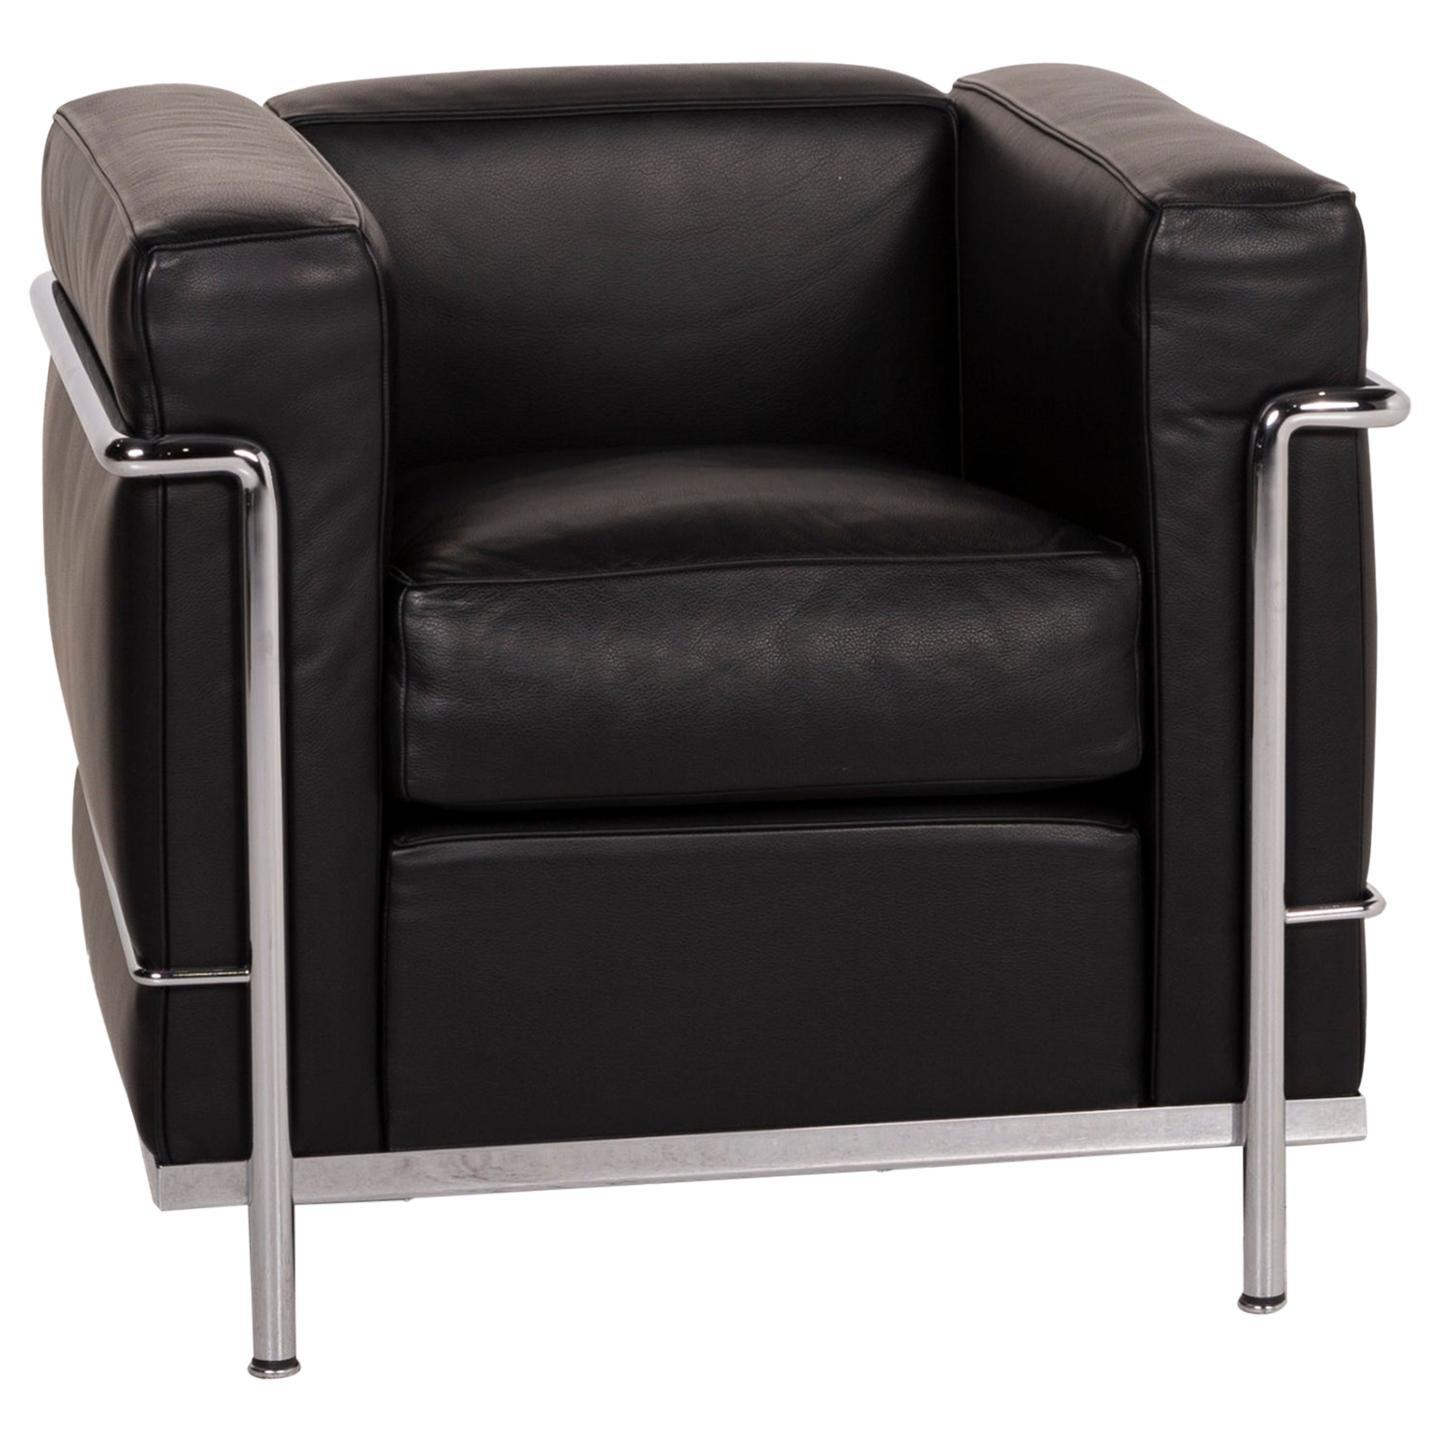 Cassina Le Corbusier LC 2 Leather Armchair Black